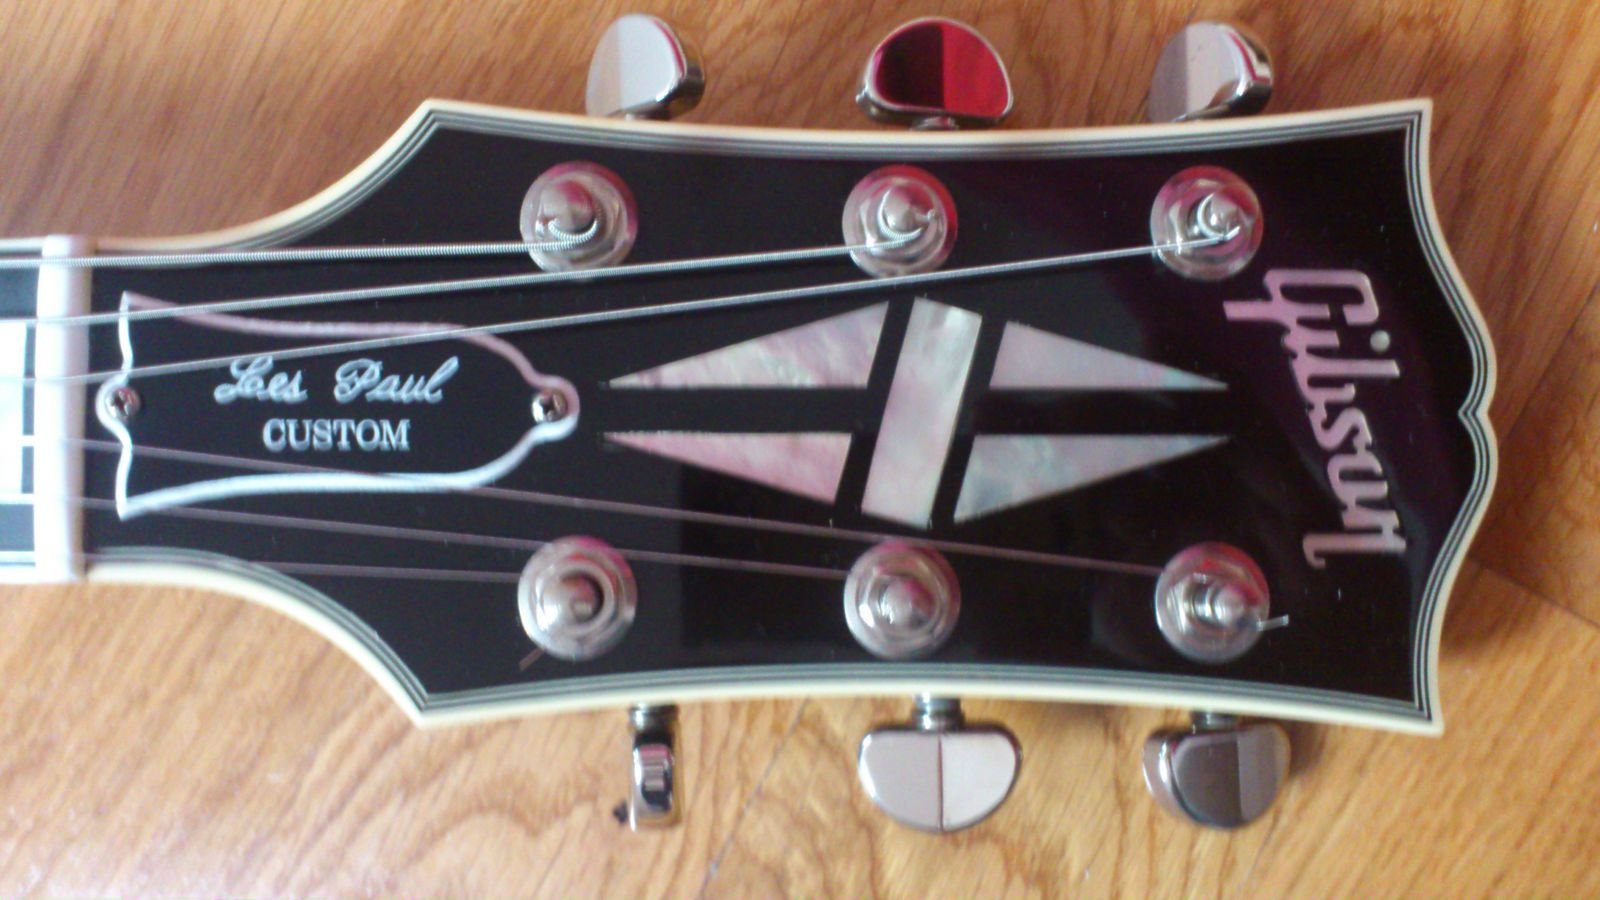 Les Paul Custom 1968 Authentic Custom Shop Ebony Gibson Audiofanzine